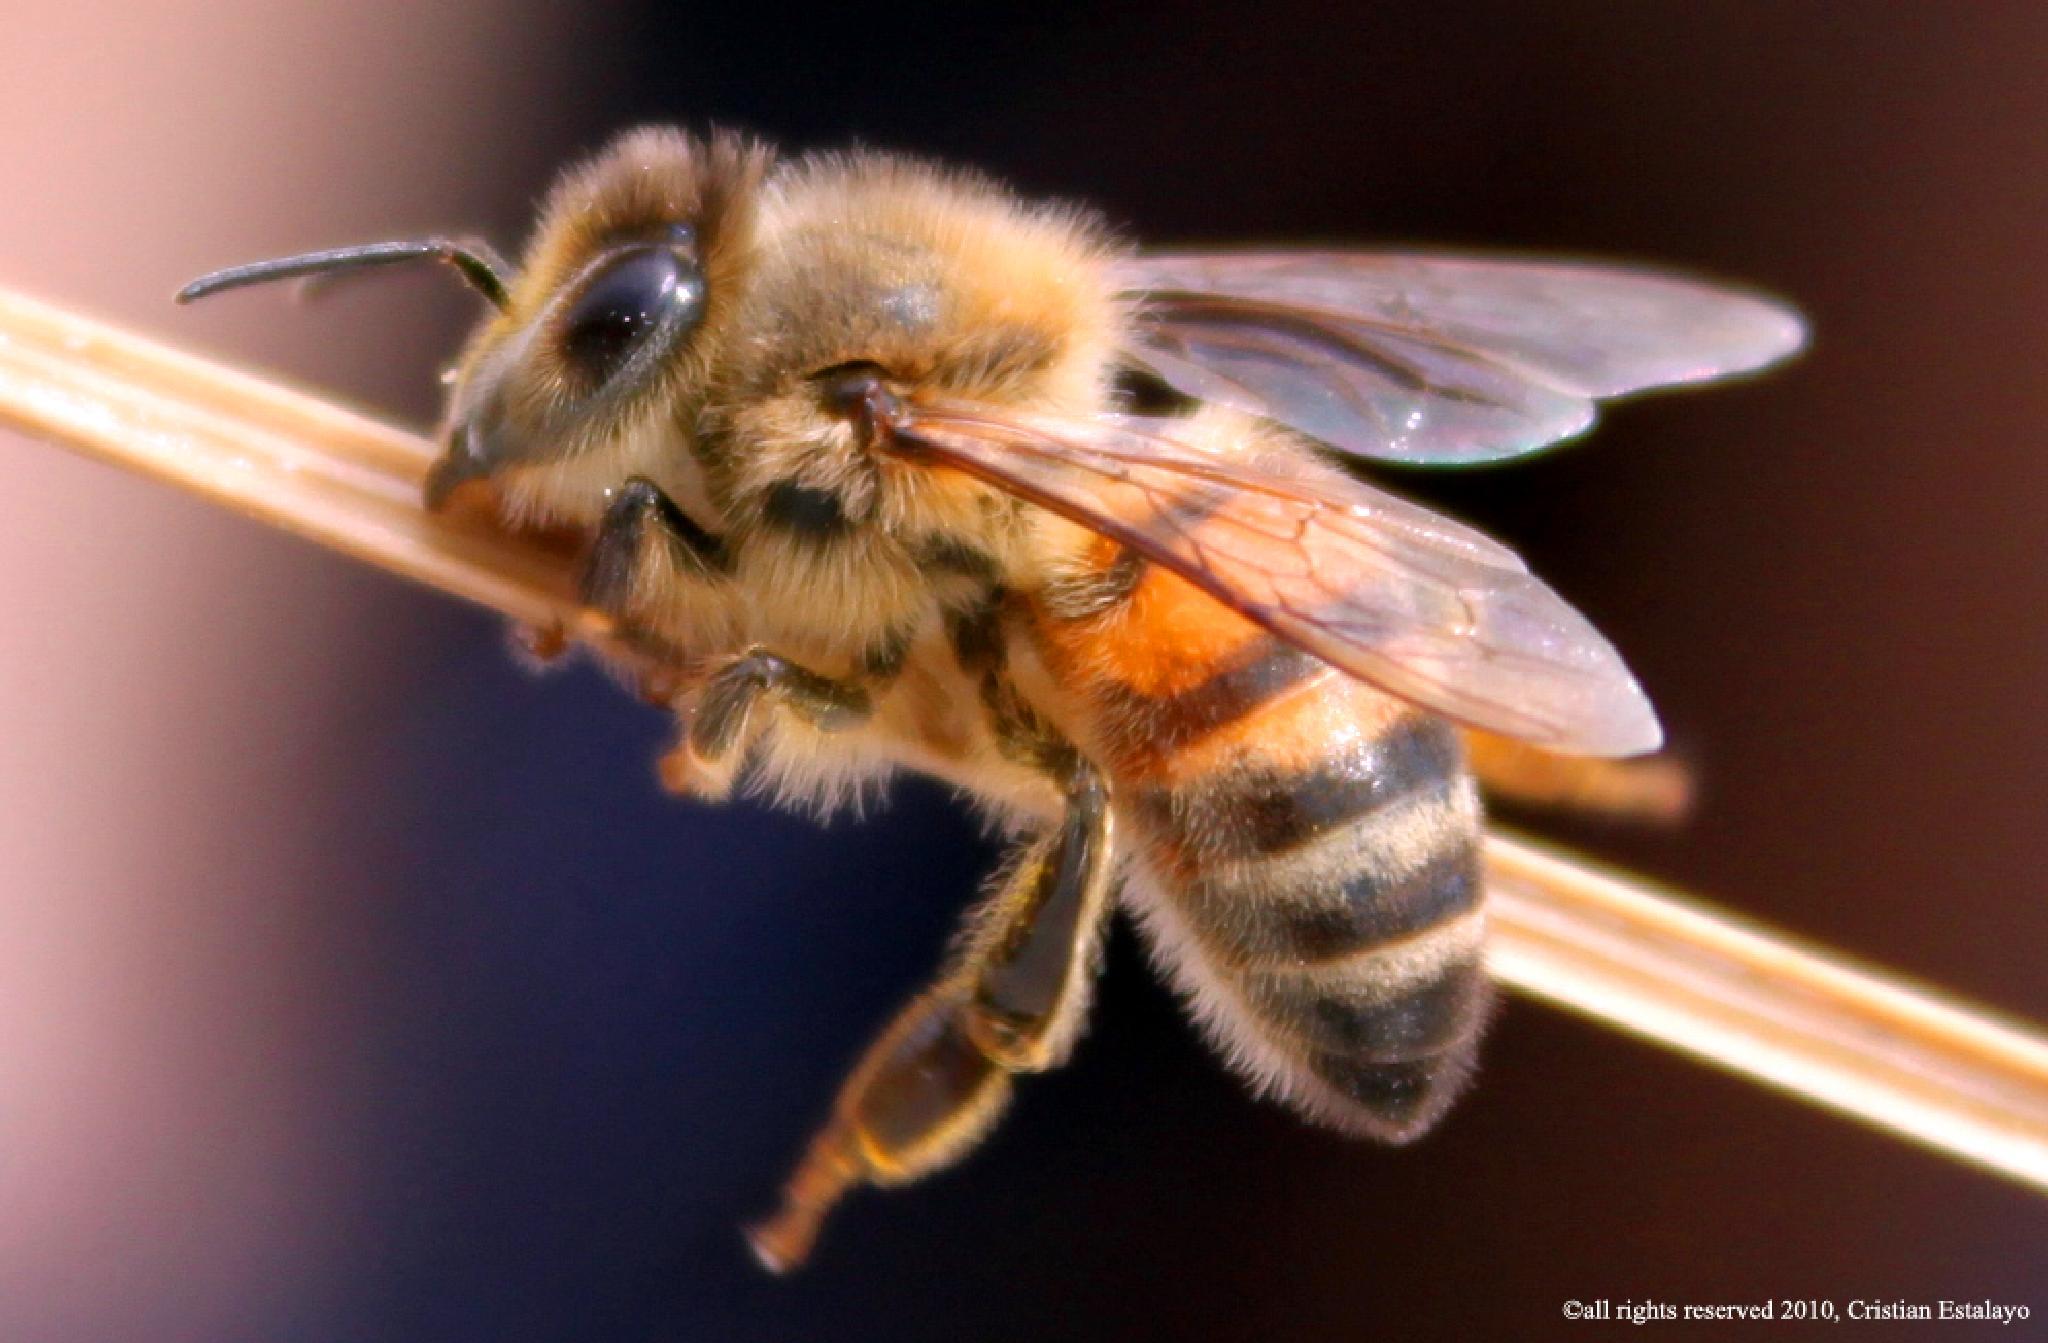 The Bee by Cris Estalayo